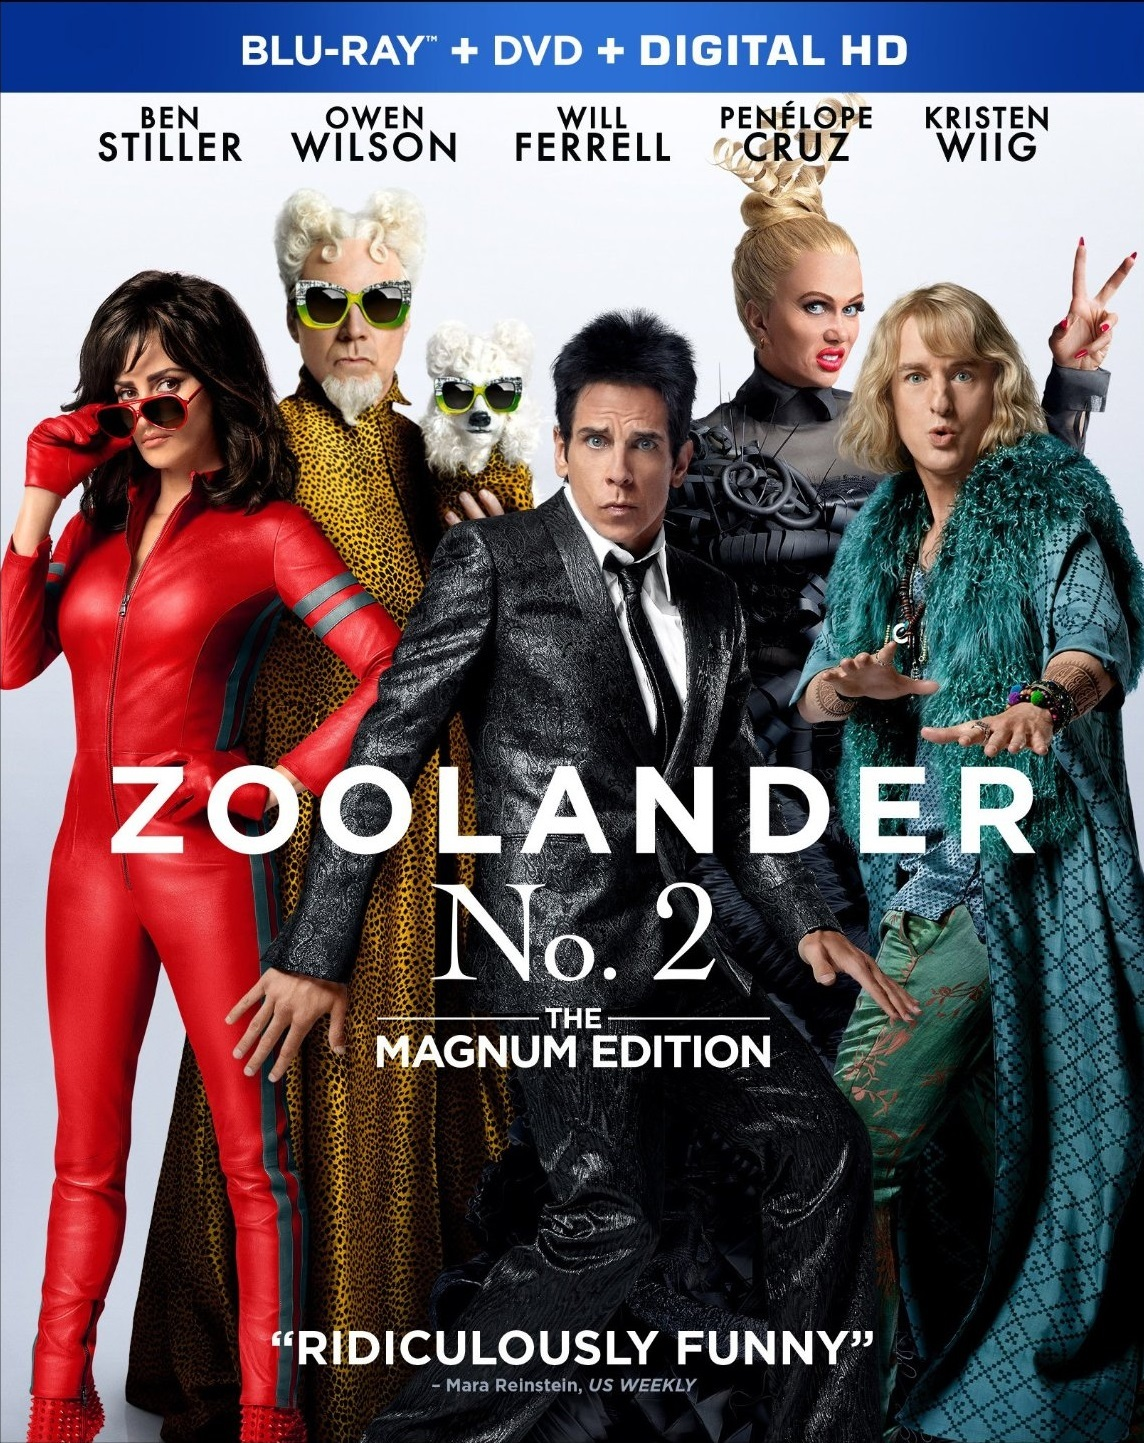 Zoolander 2 (2016) poster image